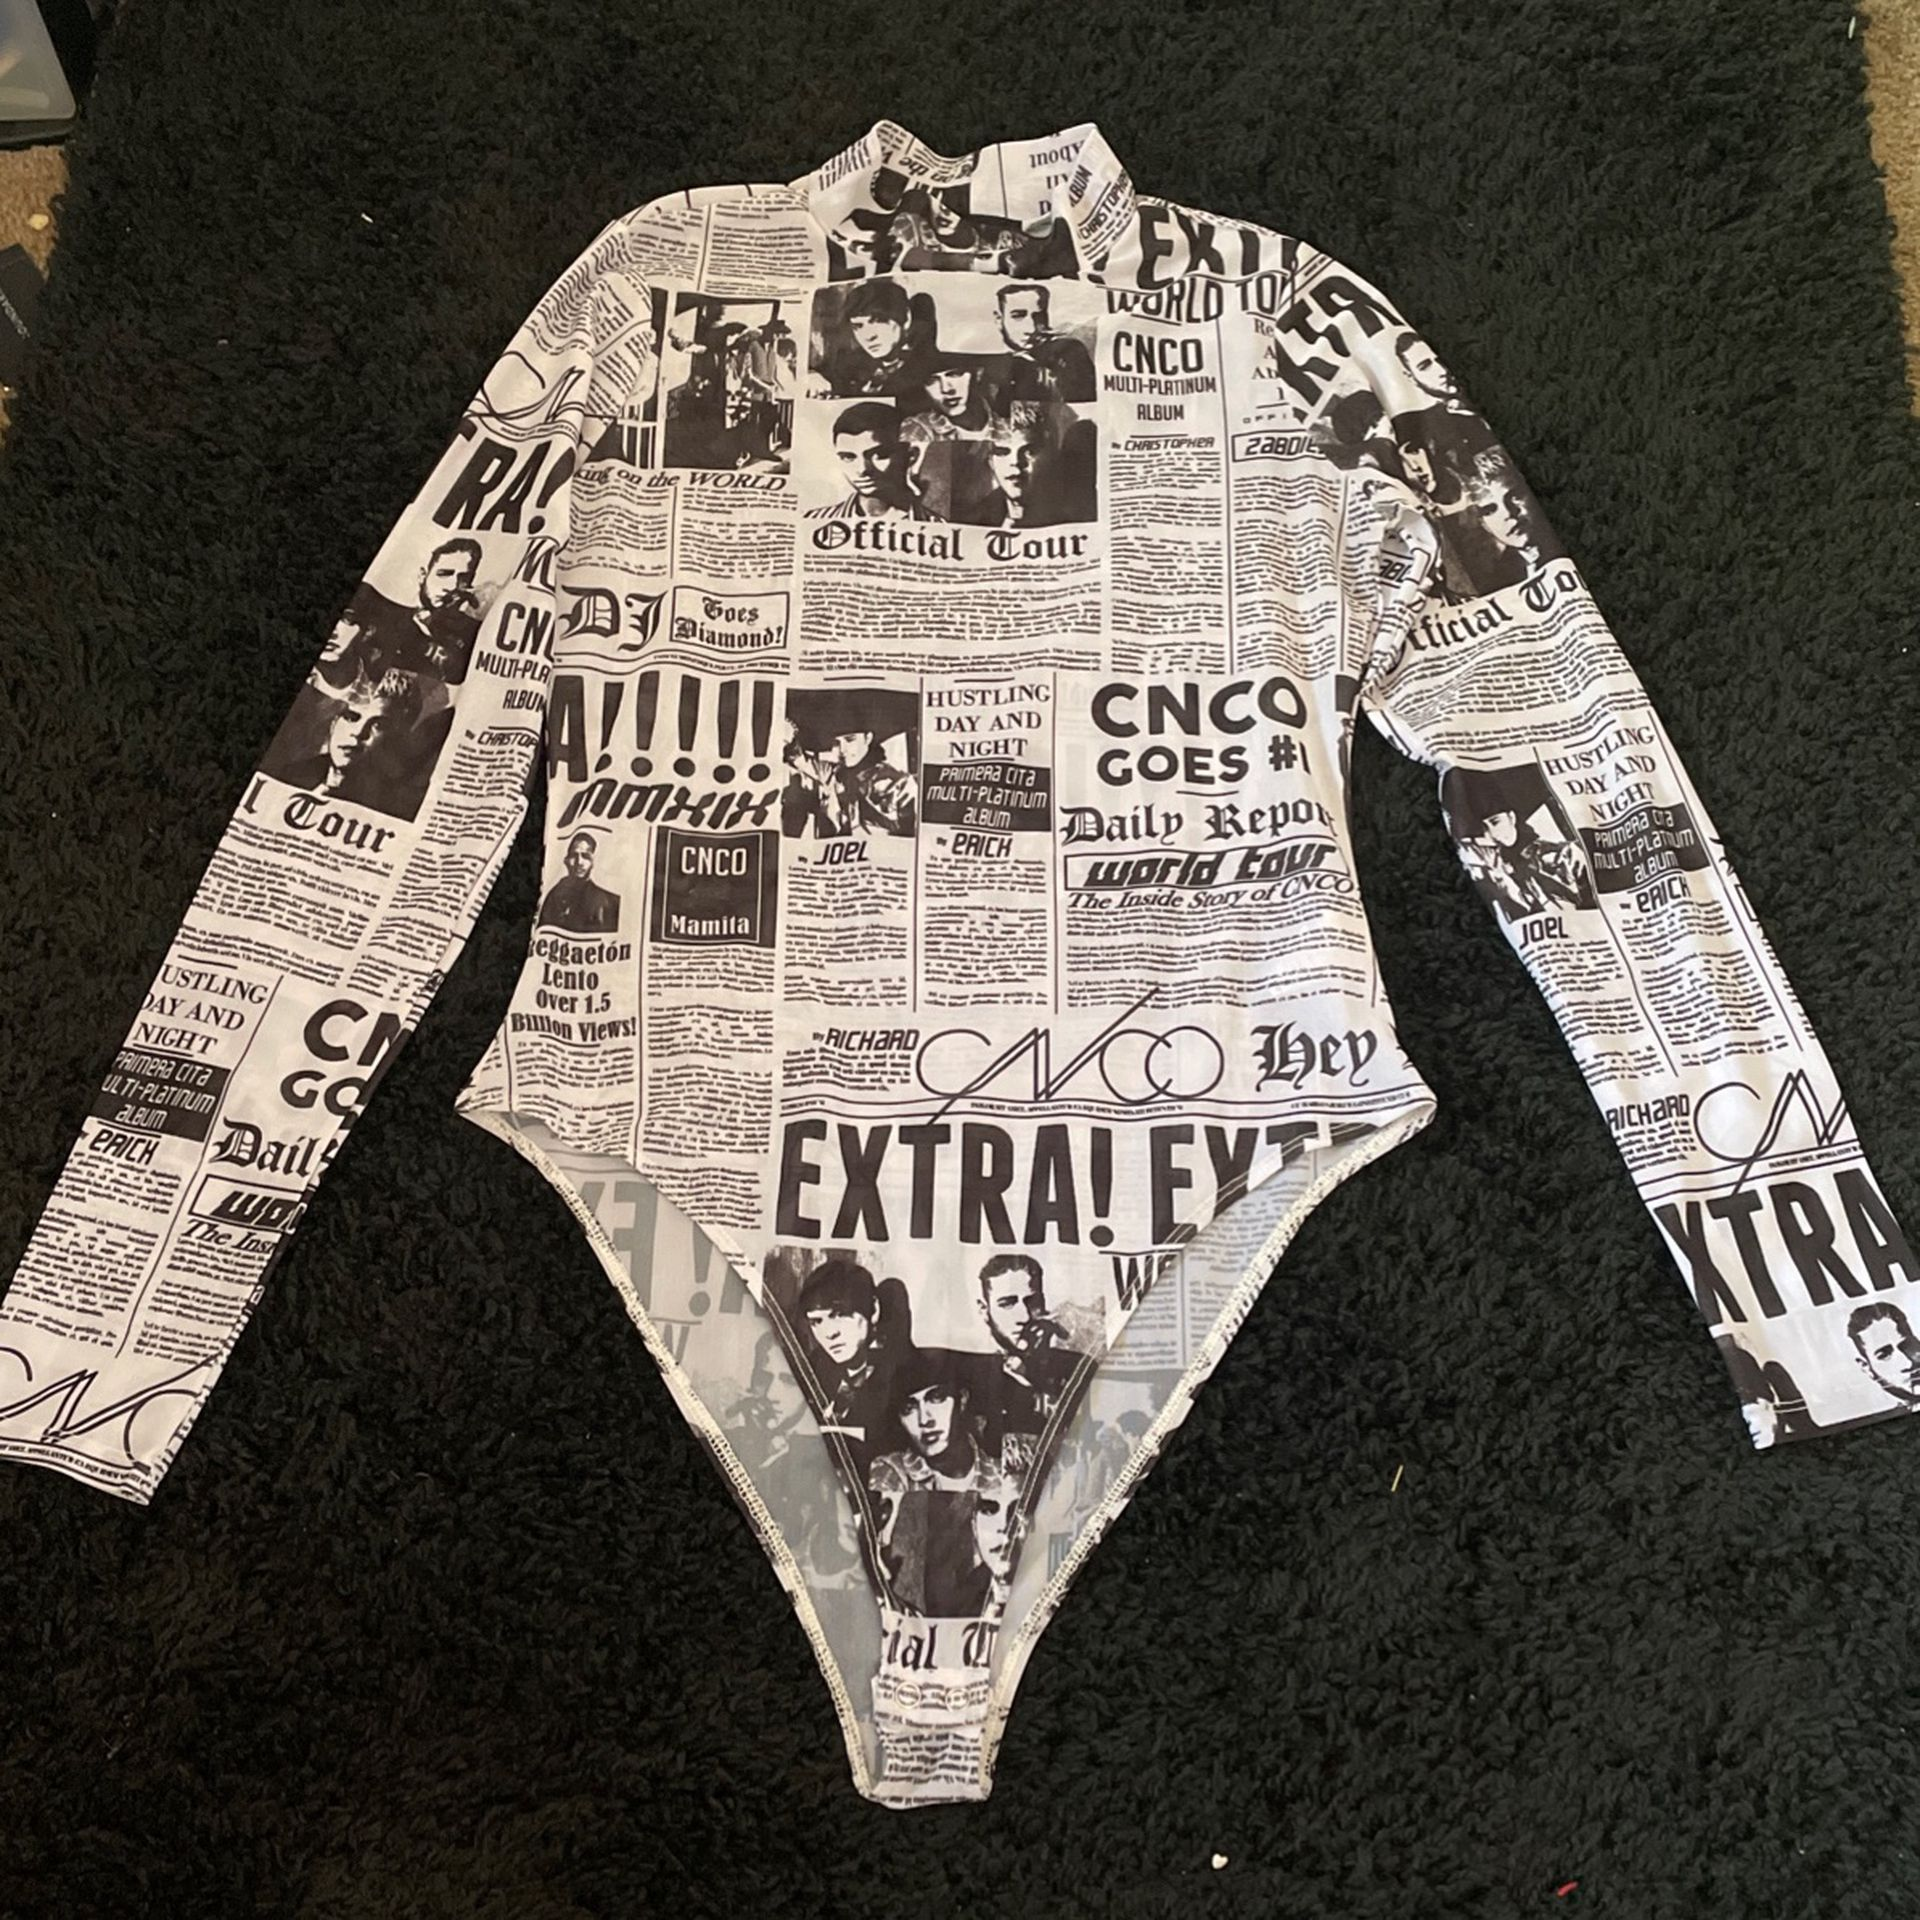 size L, see thru shirt, worn once